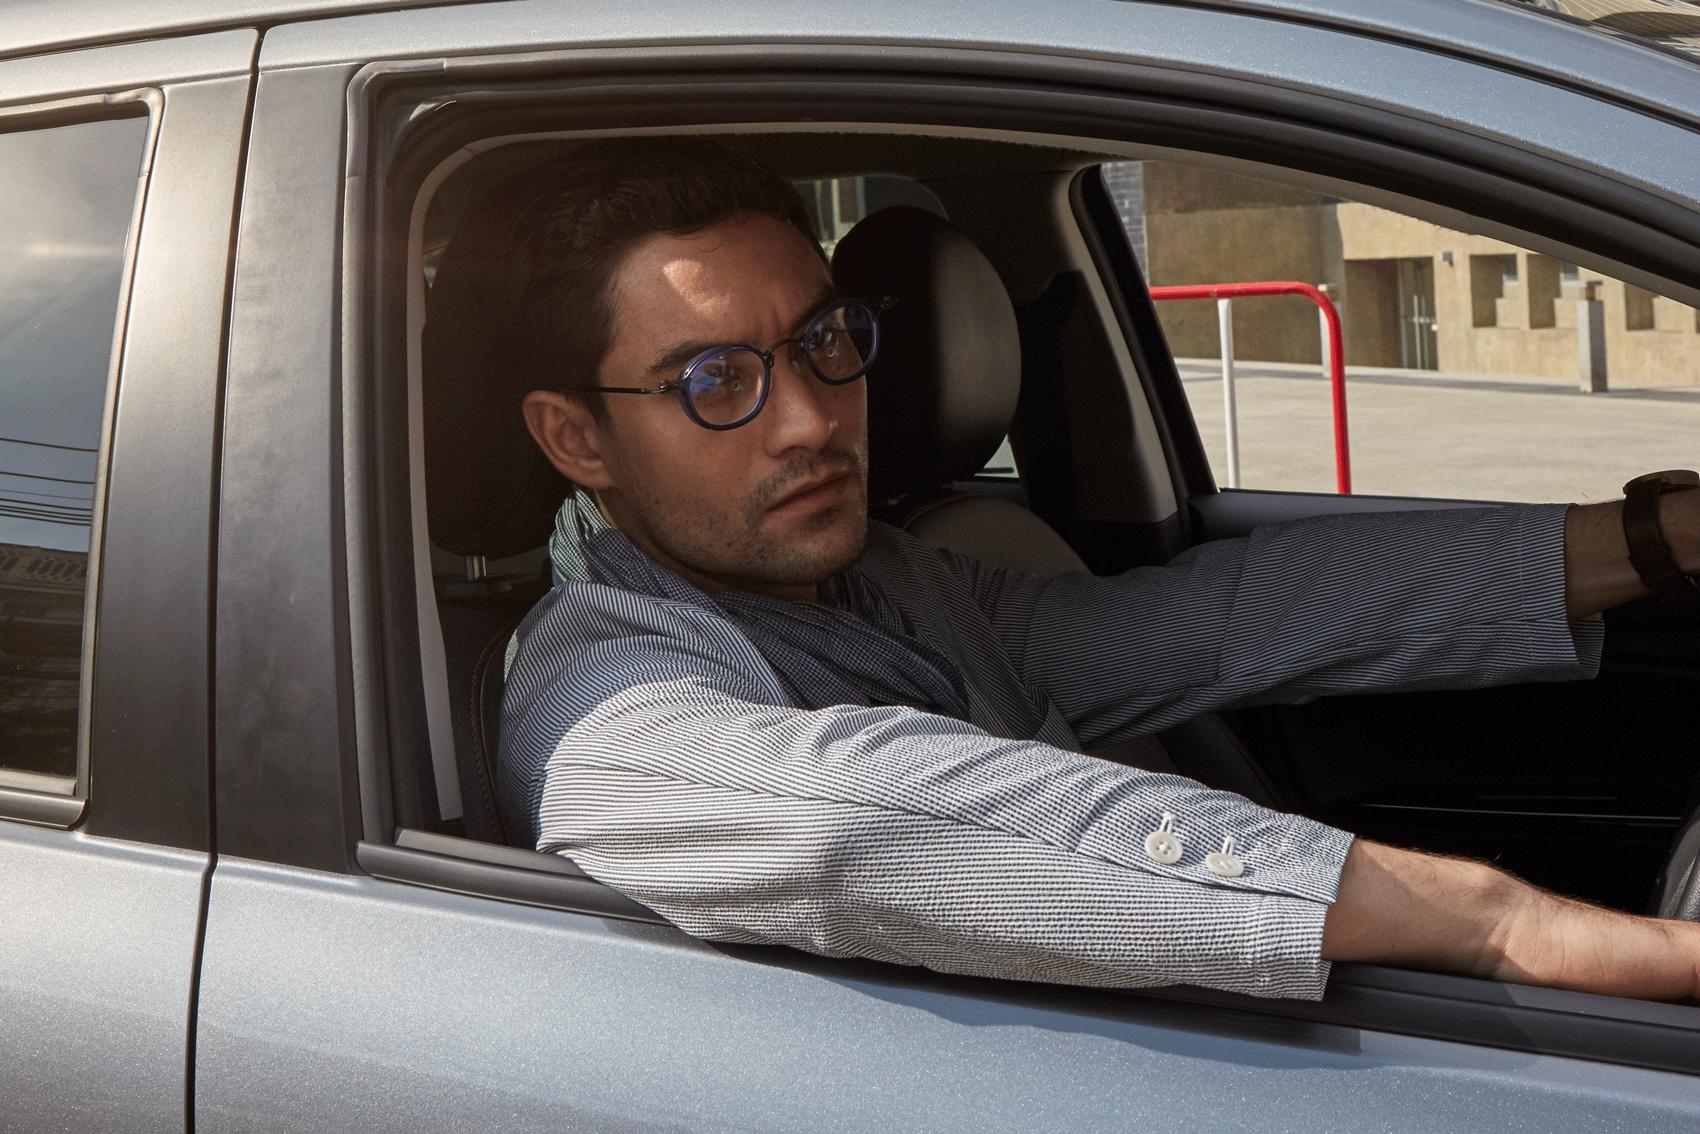 car : Mitsubishi NEW Attrage  clothes : MUJI / eyeglasses : TAVAT